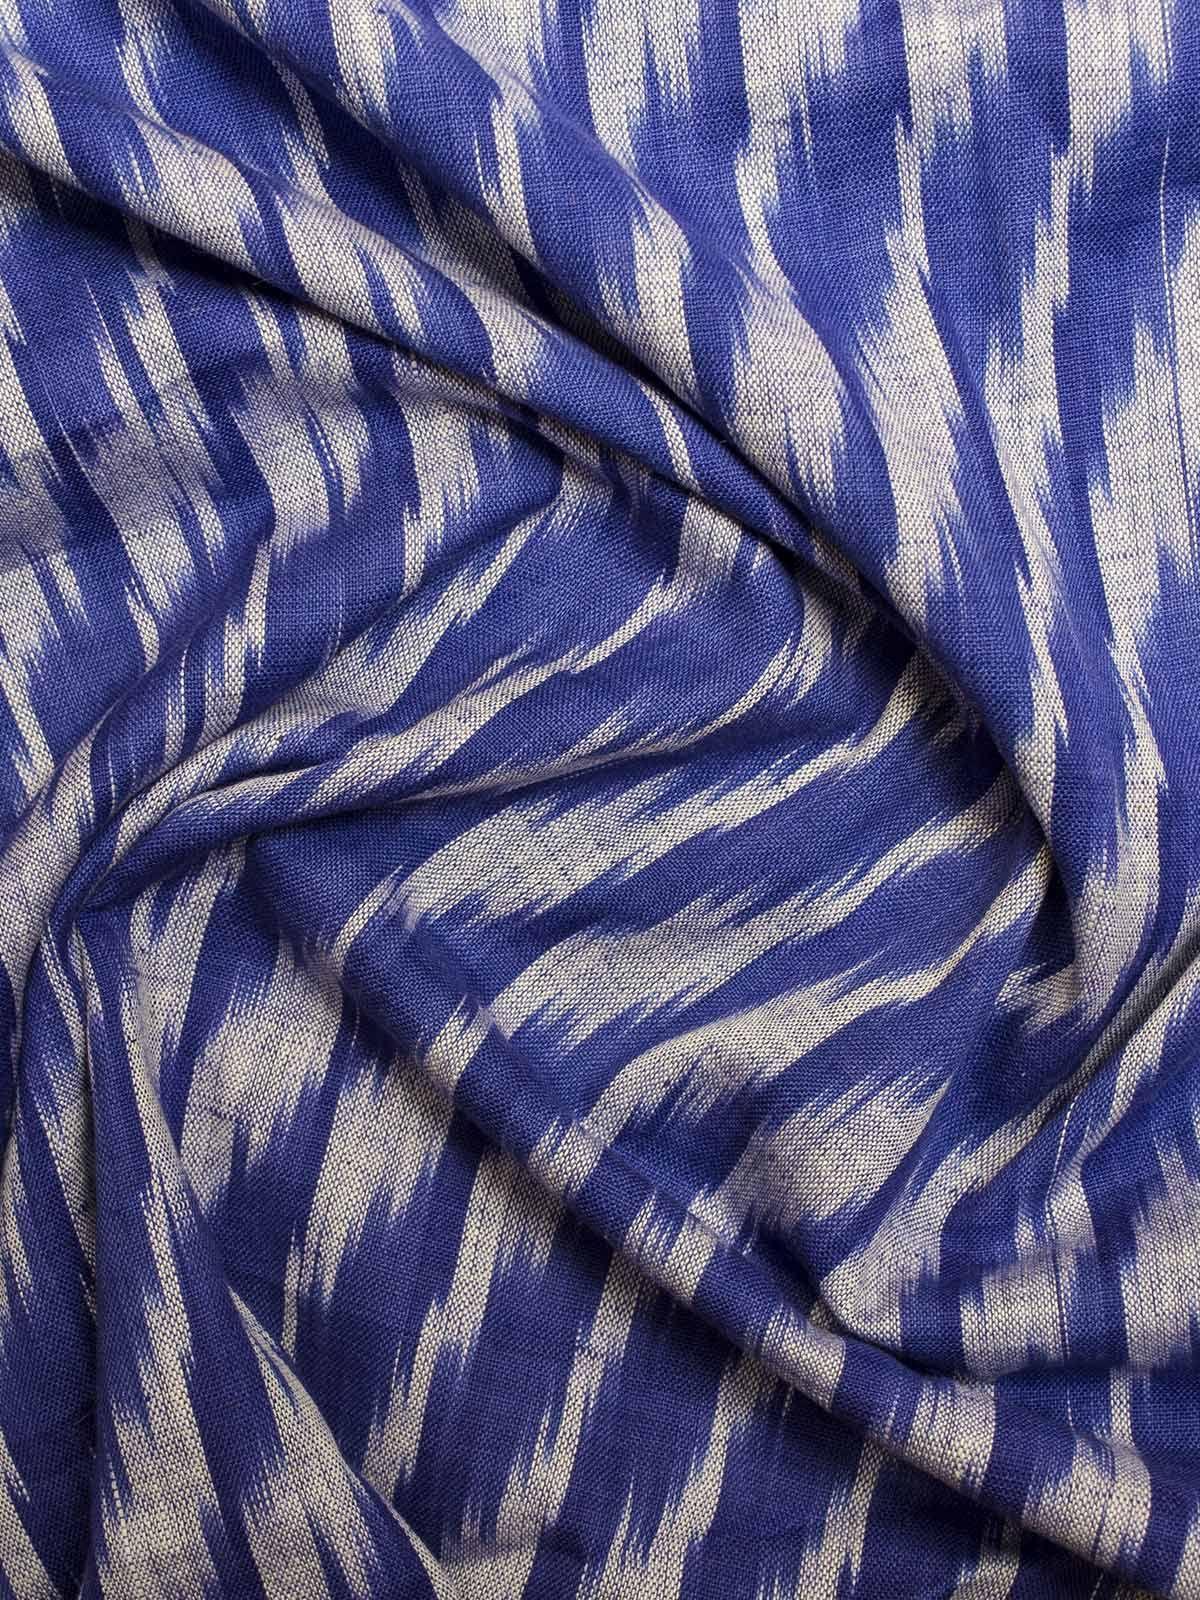 Ink Blue Ikat Cotton Fabric